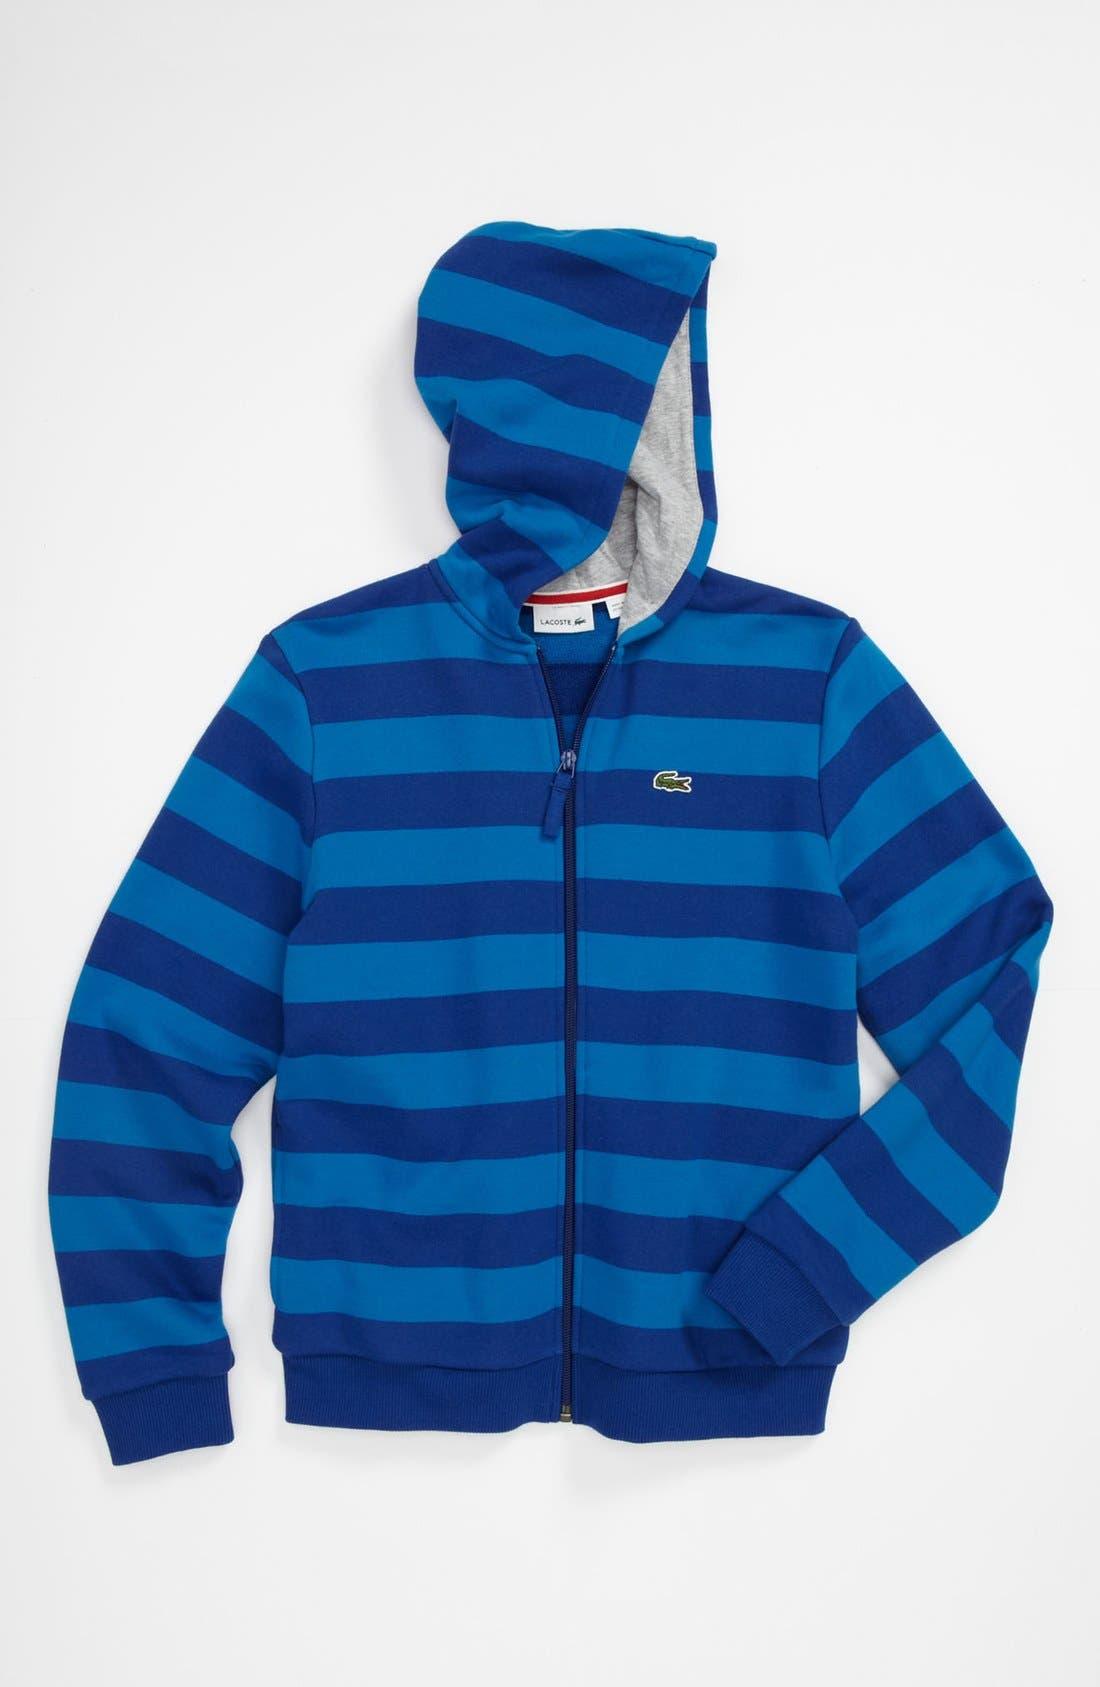 Alternate Image 1 Selected - Lacoste Stripe Sweatshirt (Big Boys)